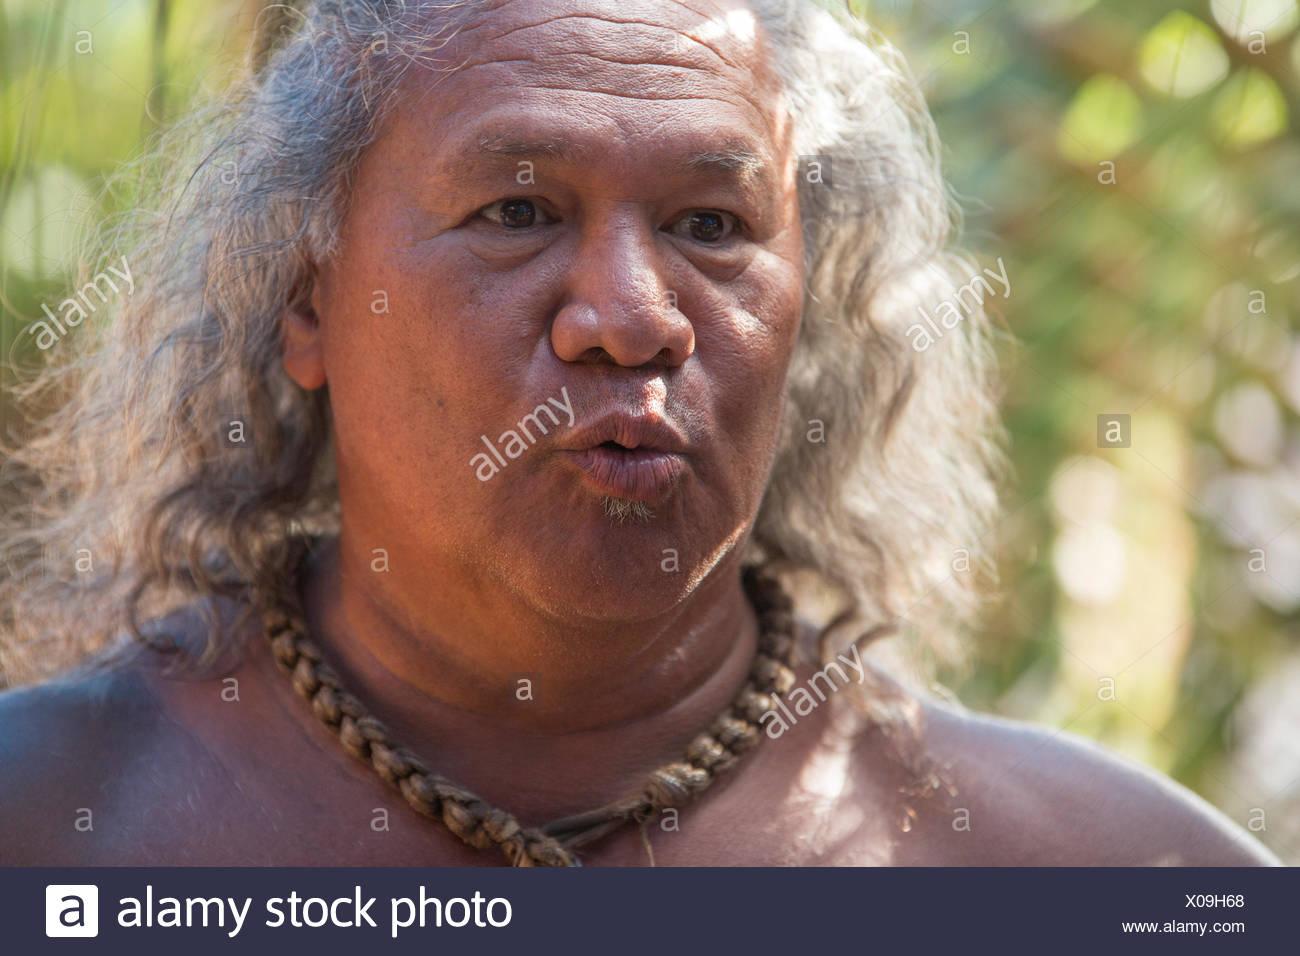 Molokai,local,Polynesian,no model-release,man,USA,Hawaii,America,portrait, - Stock Image